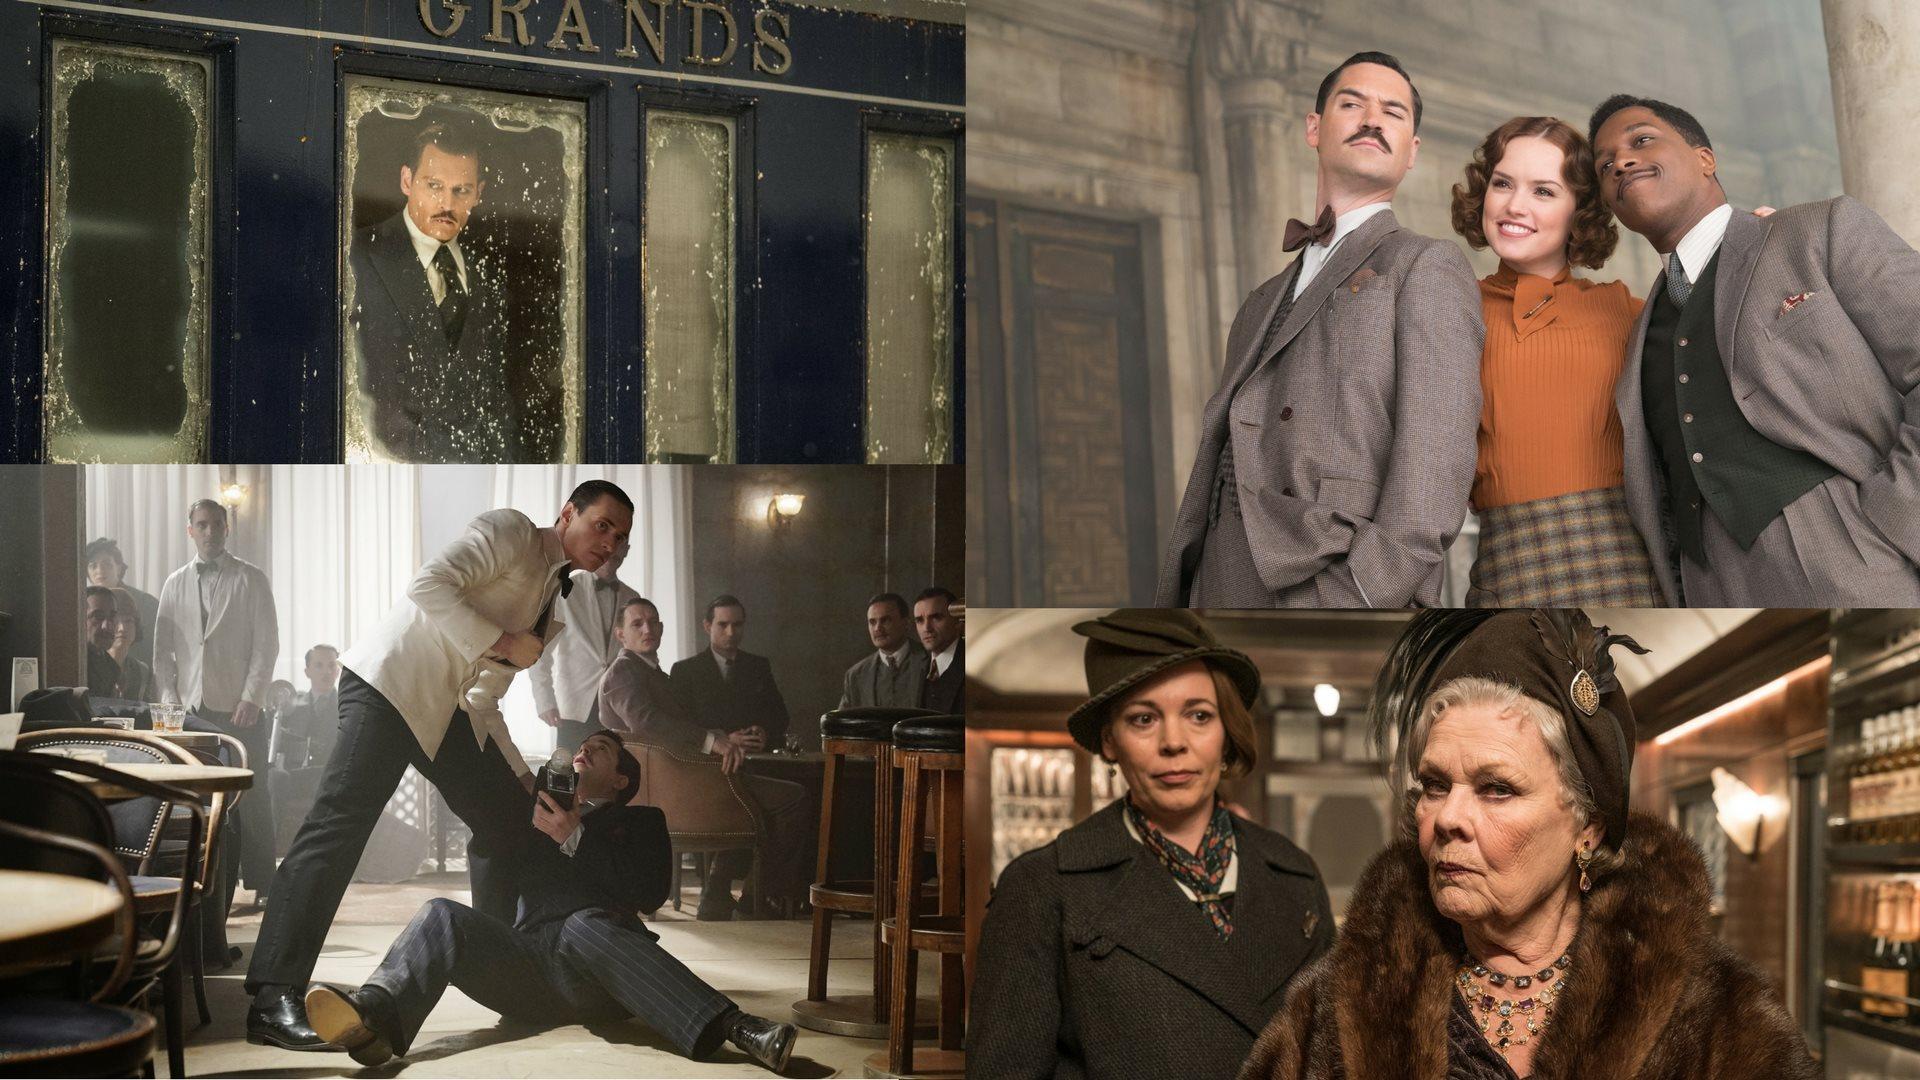 Agatha Christie, Mordet i Orientekspressen, krimi, krimier, detektiv